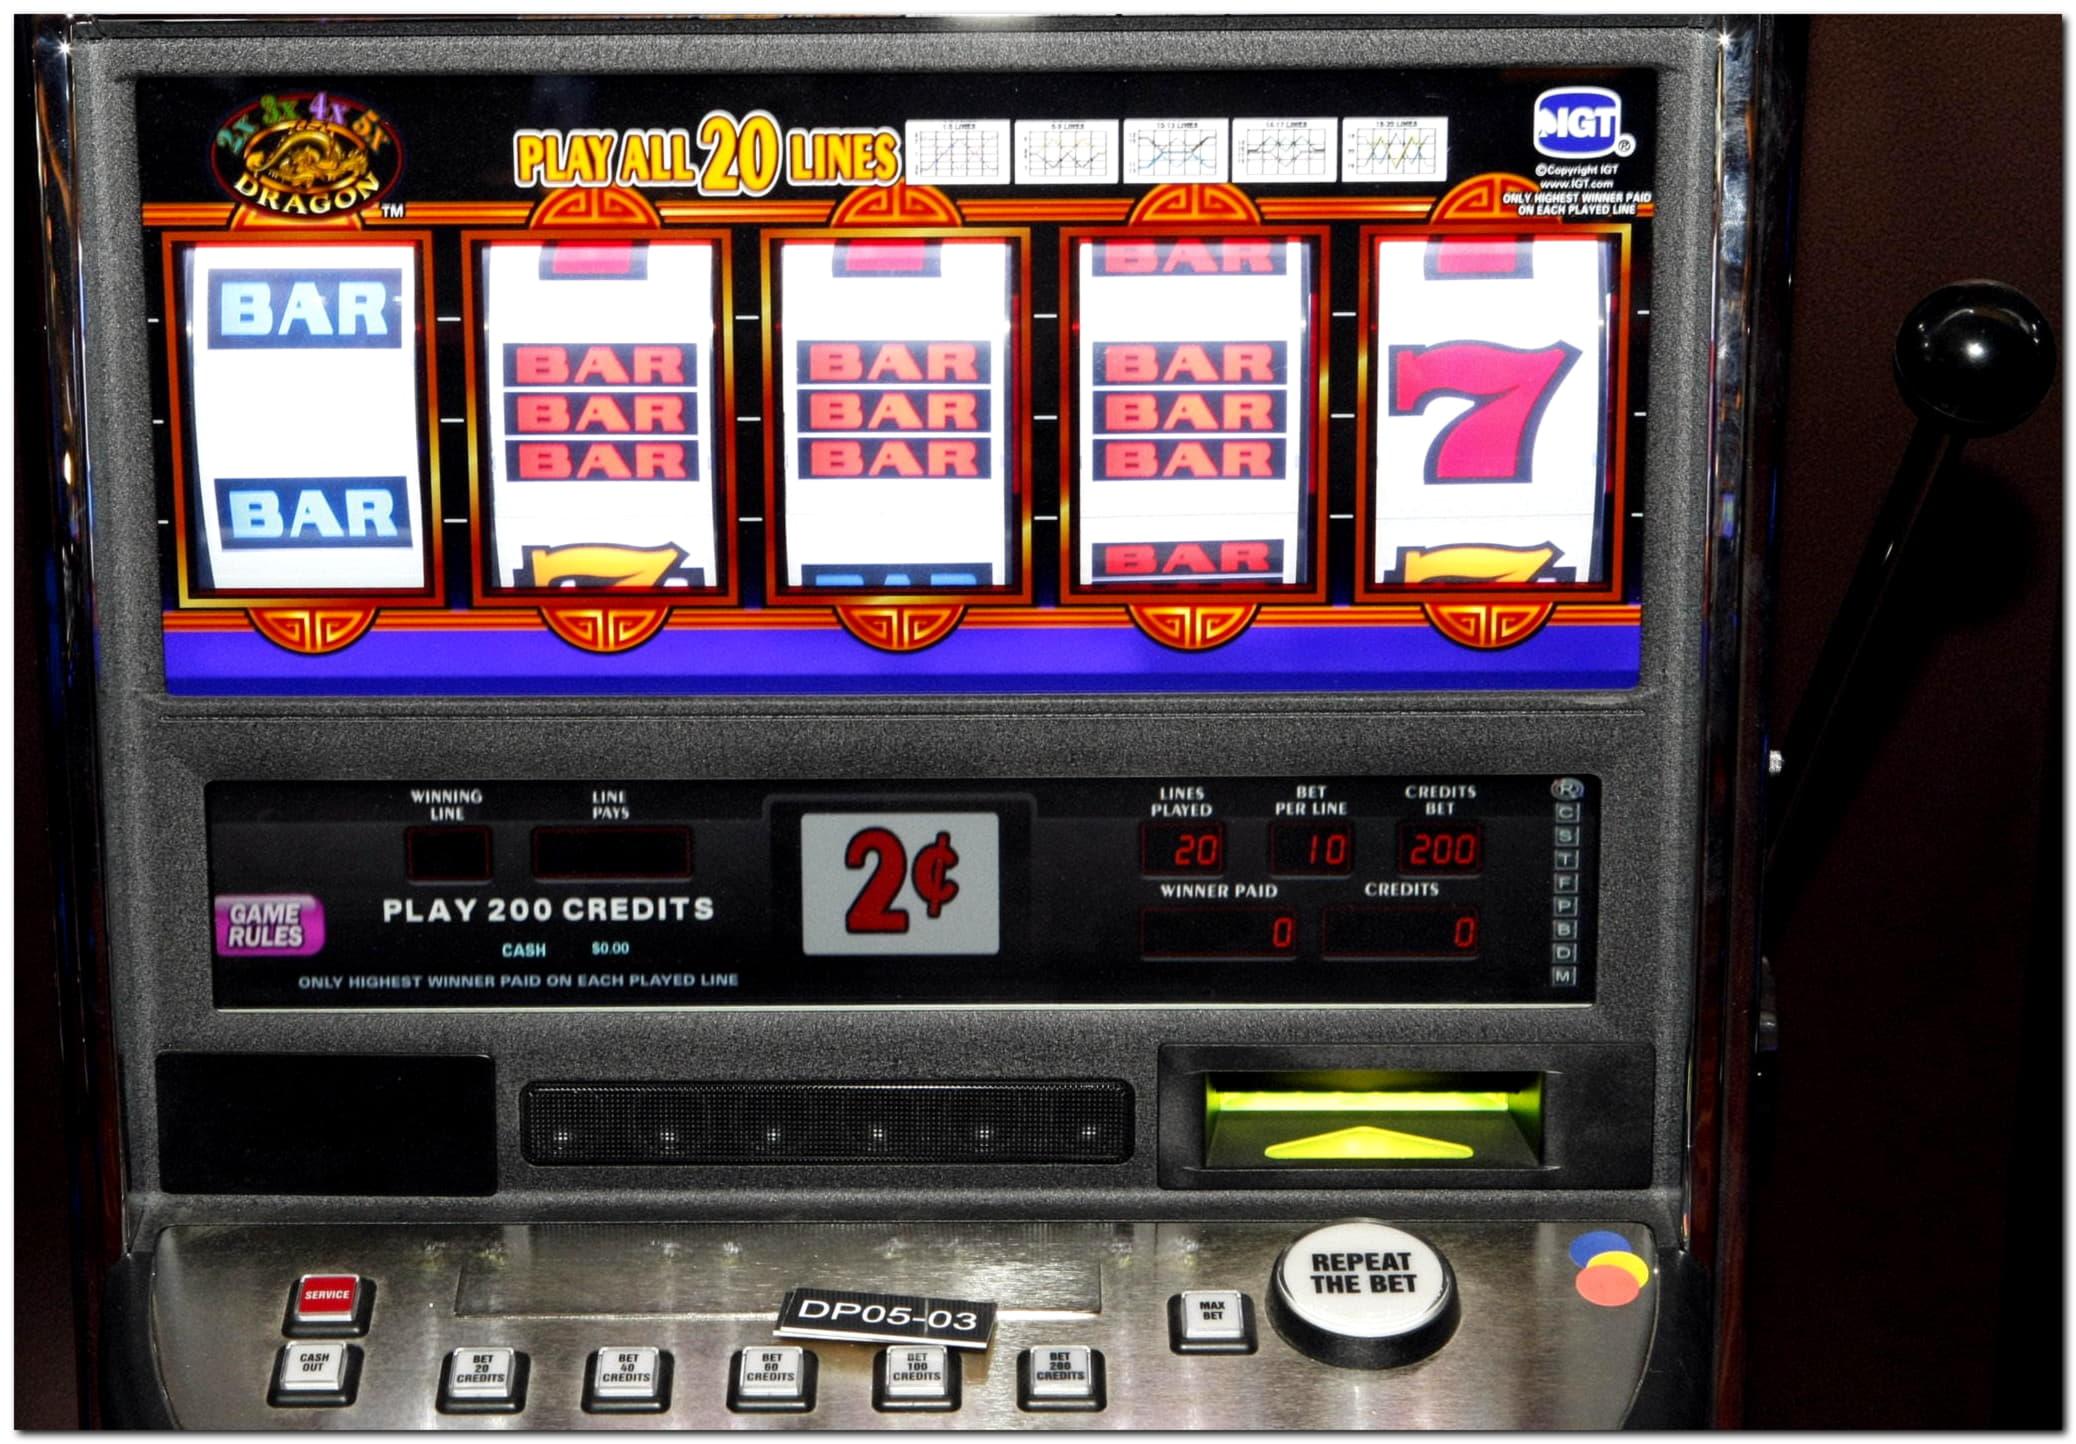 EURO 875 Casino tournaments freeroll at Next Casino